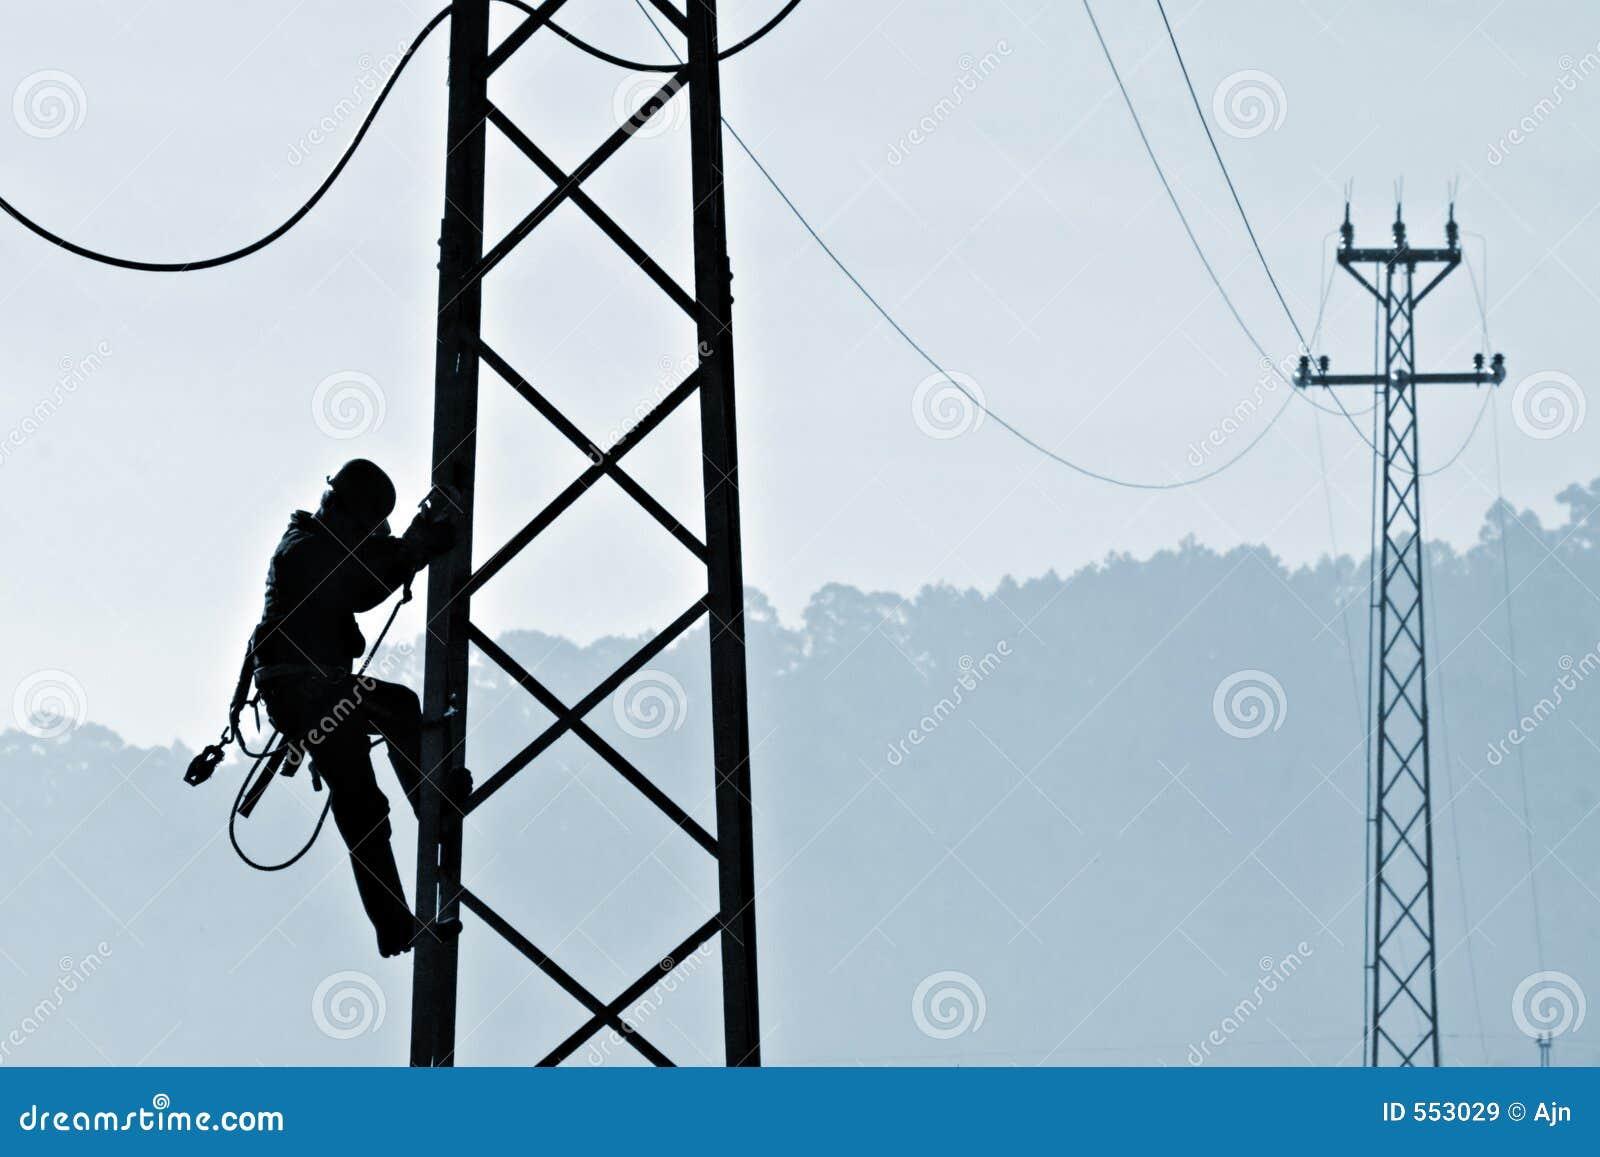 Powerplant worker